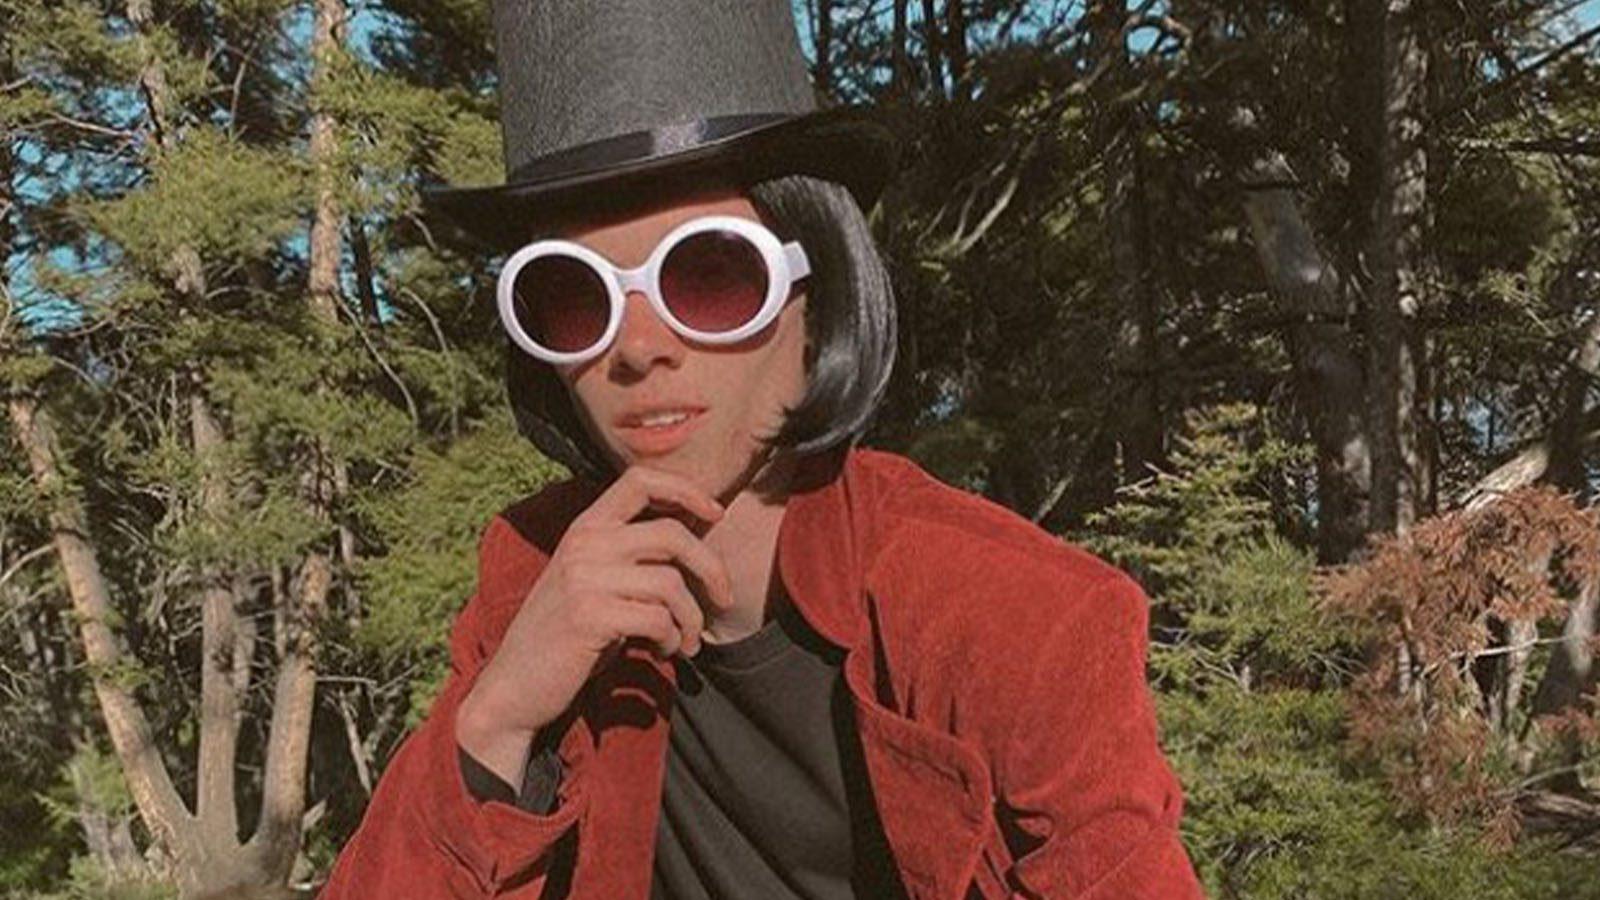 Who Is Willy Wonka On TikTok